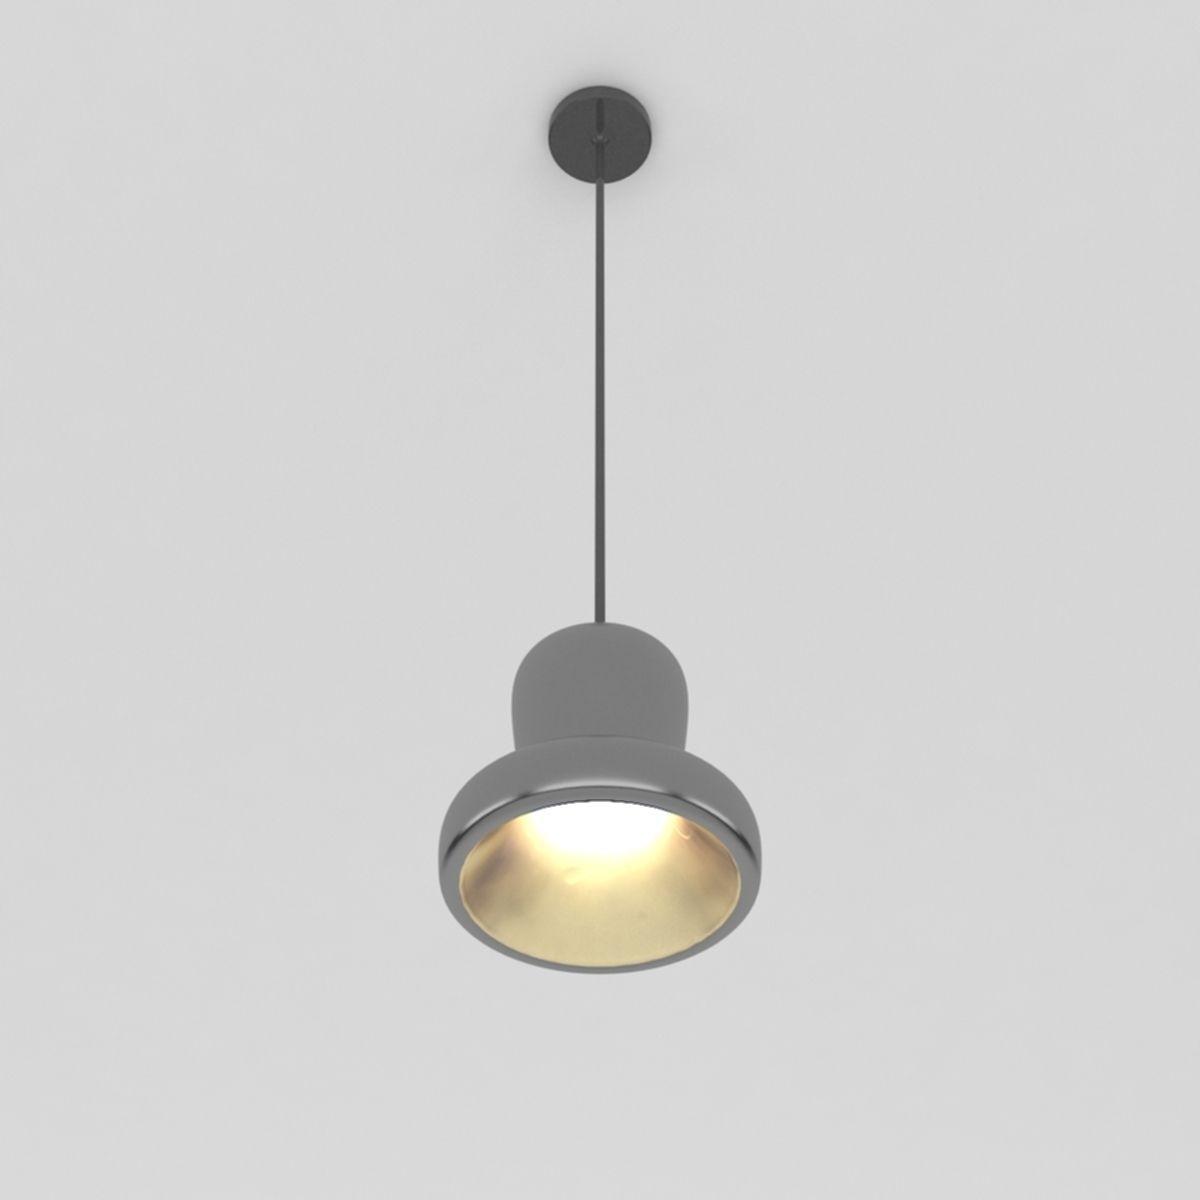 Pendant Lamp 1 3D Model MAX OBJ